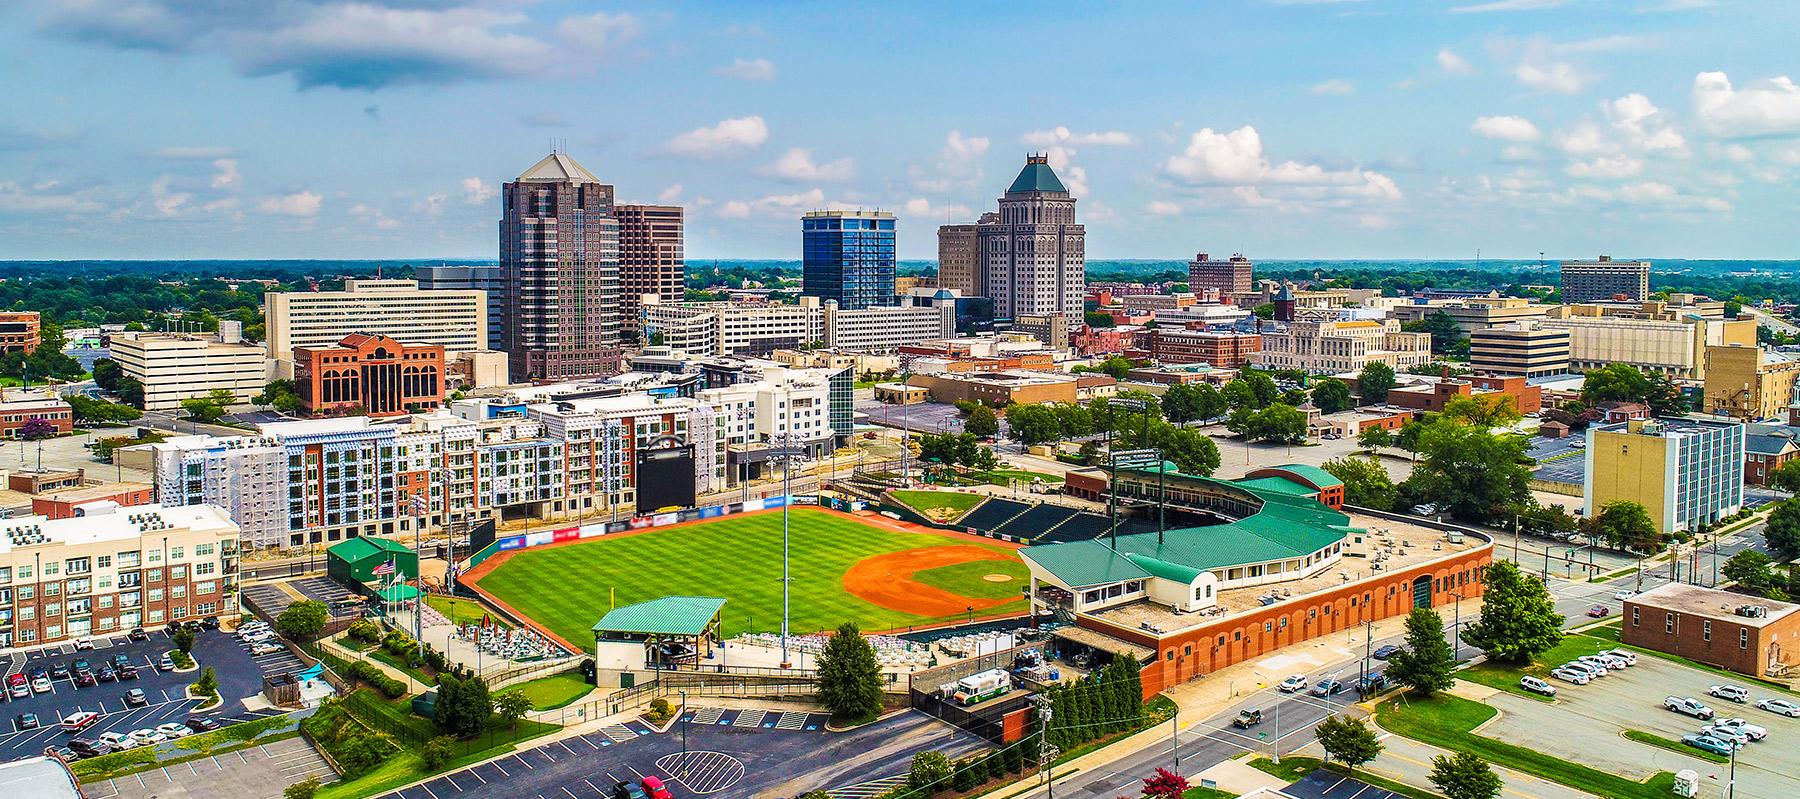 Image of Greensboro, NC